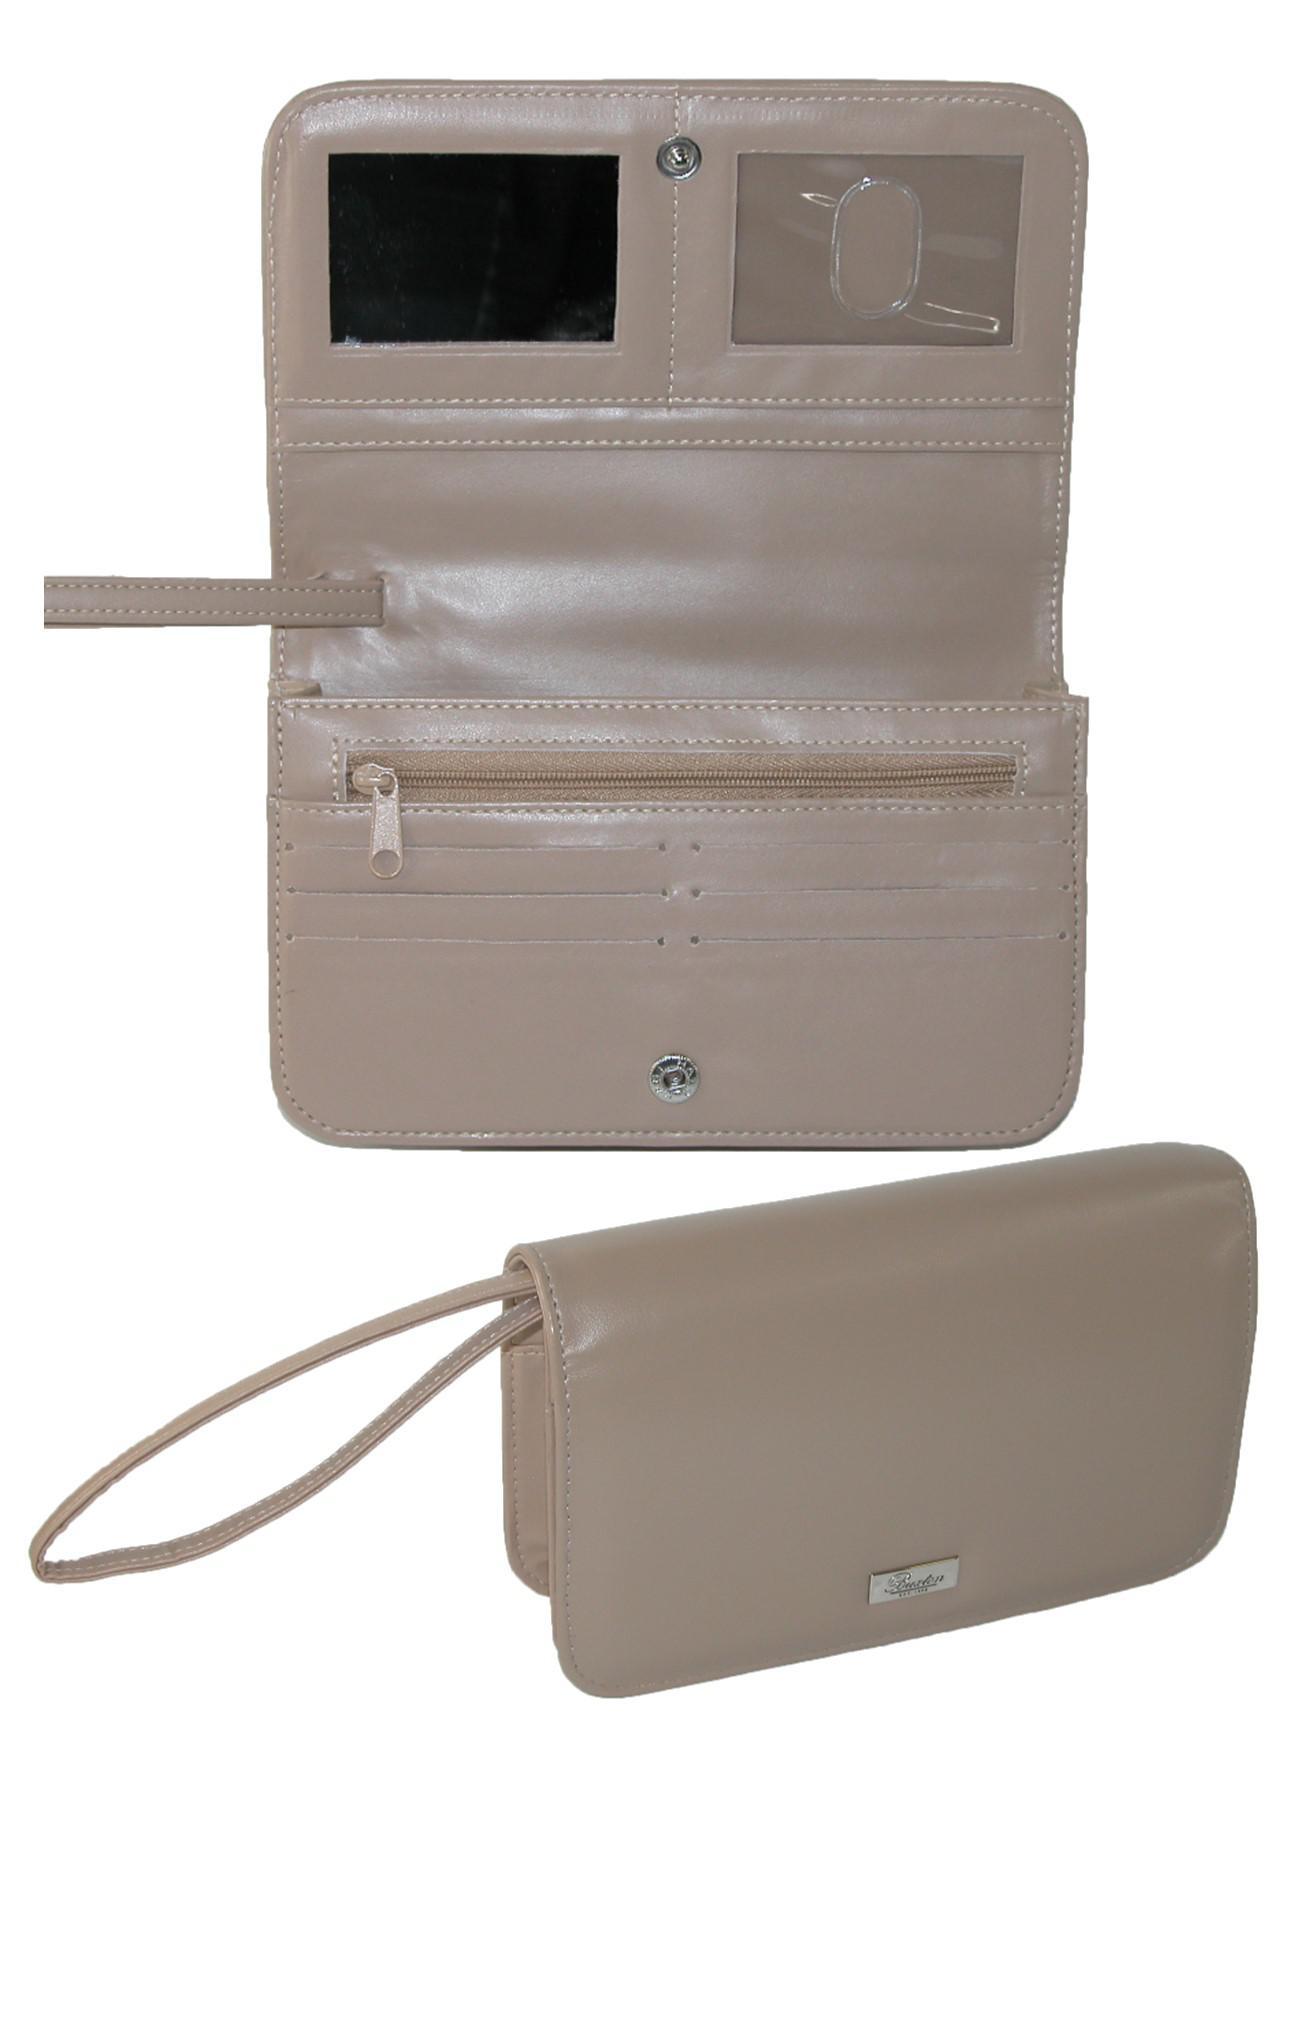 New-Buxton-Women-039-s-Synthetic-Single-Flap-Mini-Cross-Body-Handbag